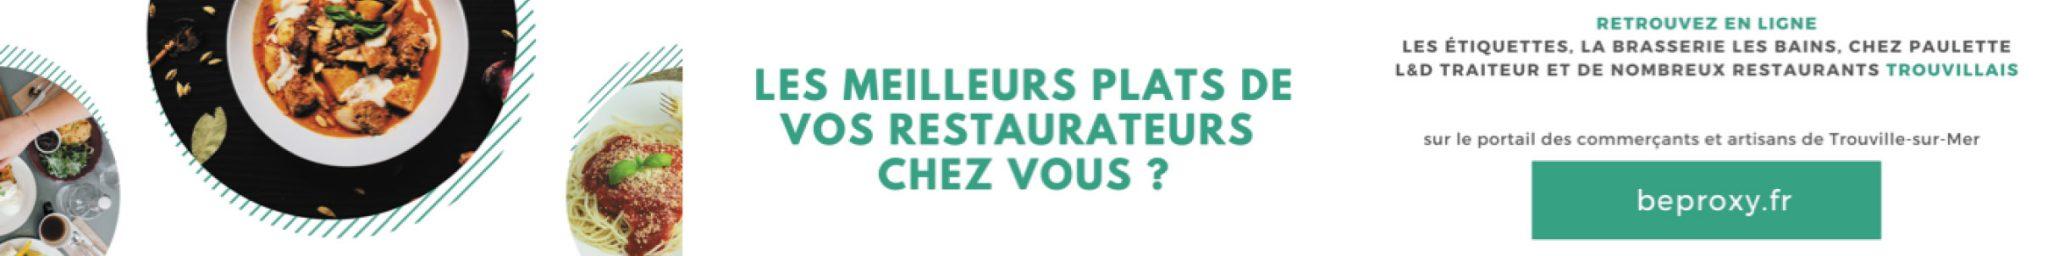 beproxy.fr